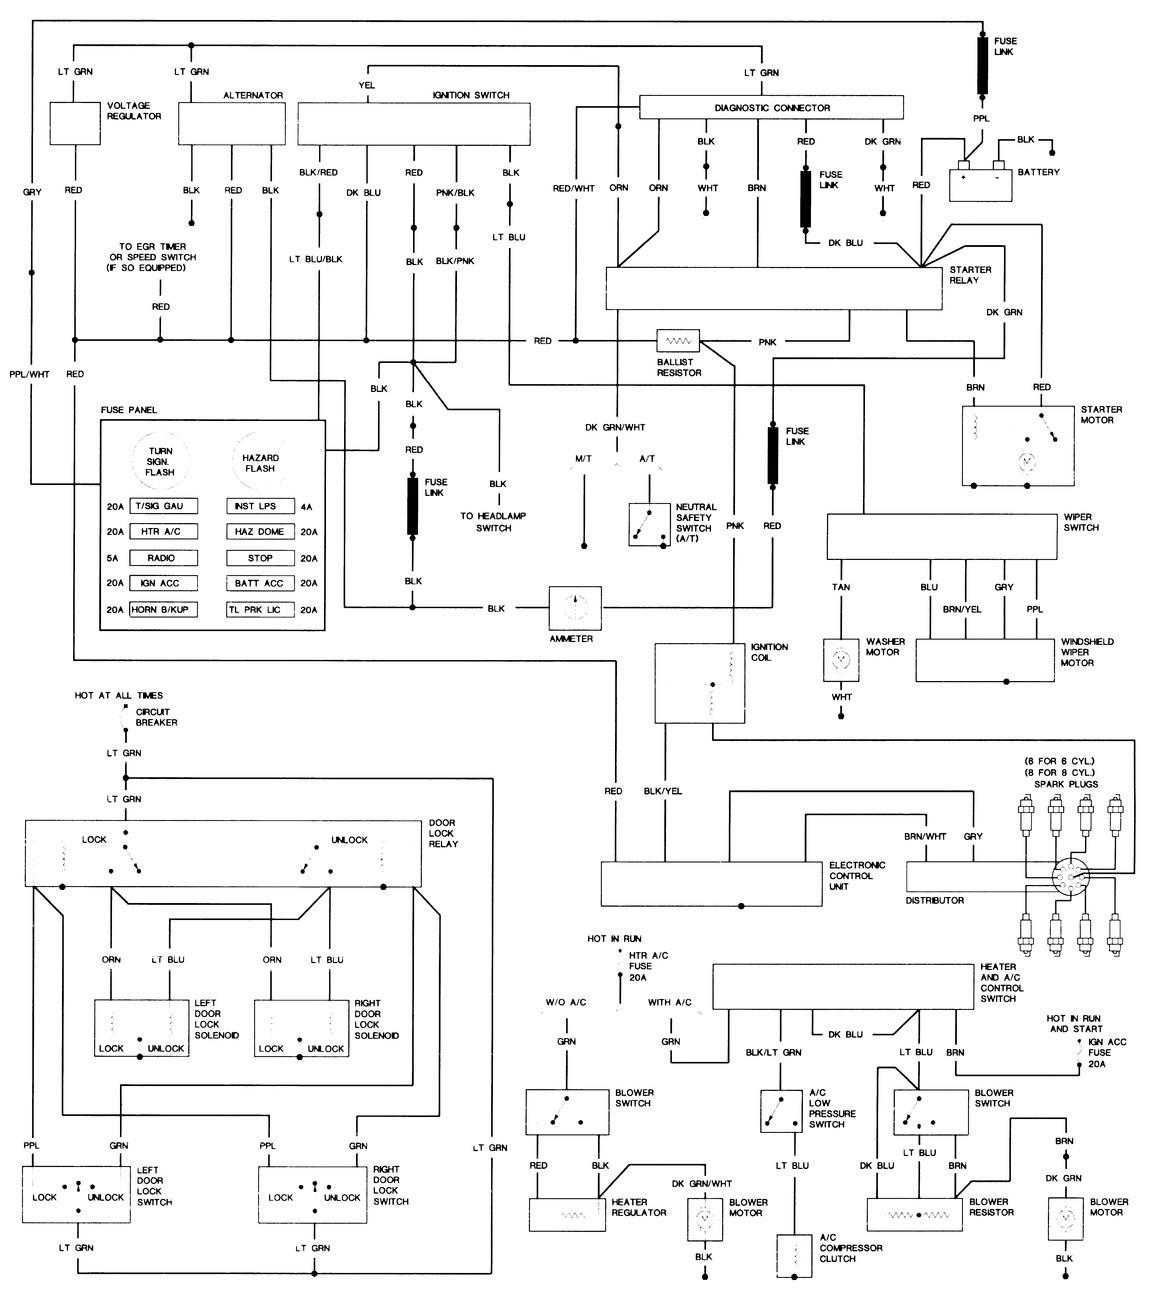 1998 dodge ram van radio wiring diagram 1996 civic ford 8n distributor fuse box